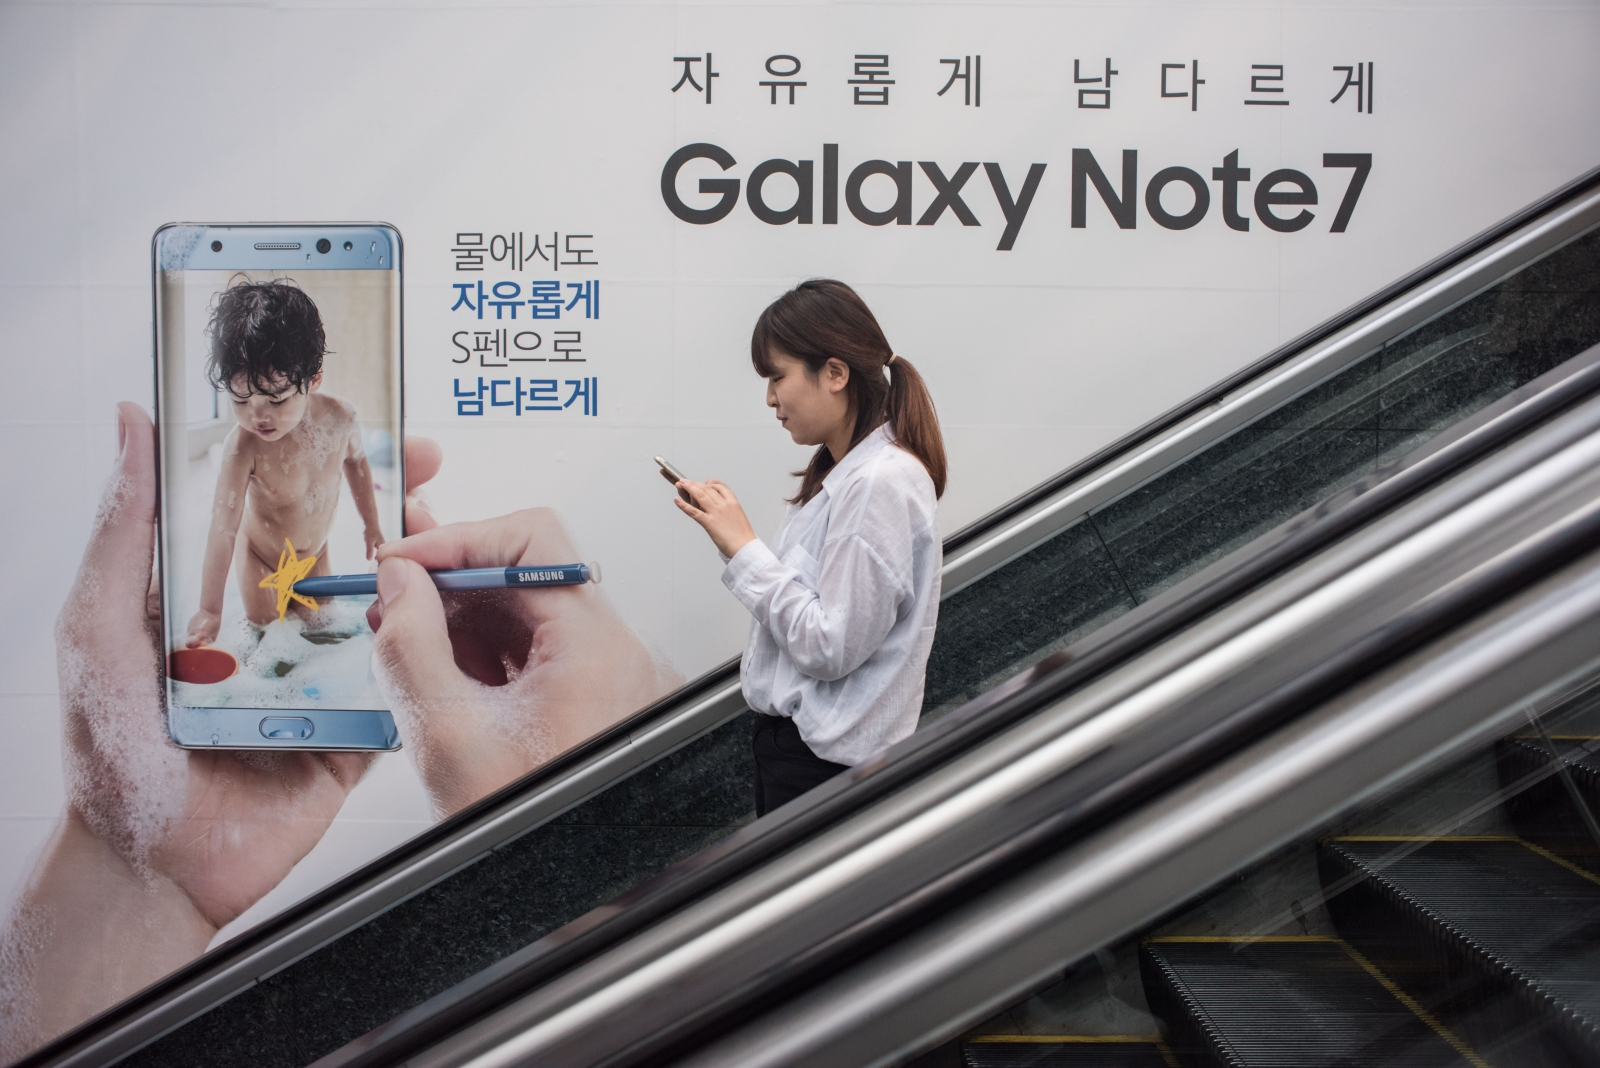 Refurbished Galaxy Note 7 coming to Korea